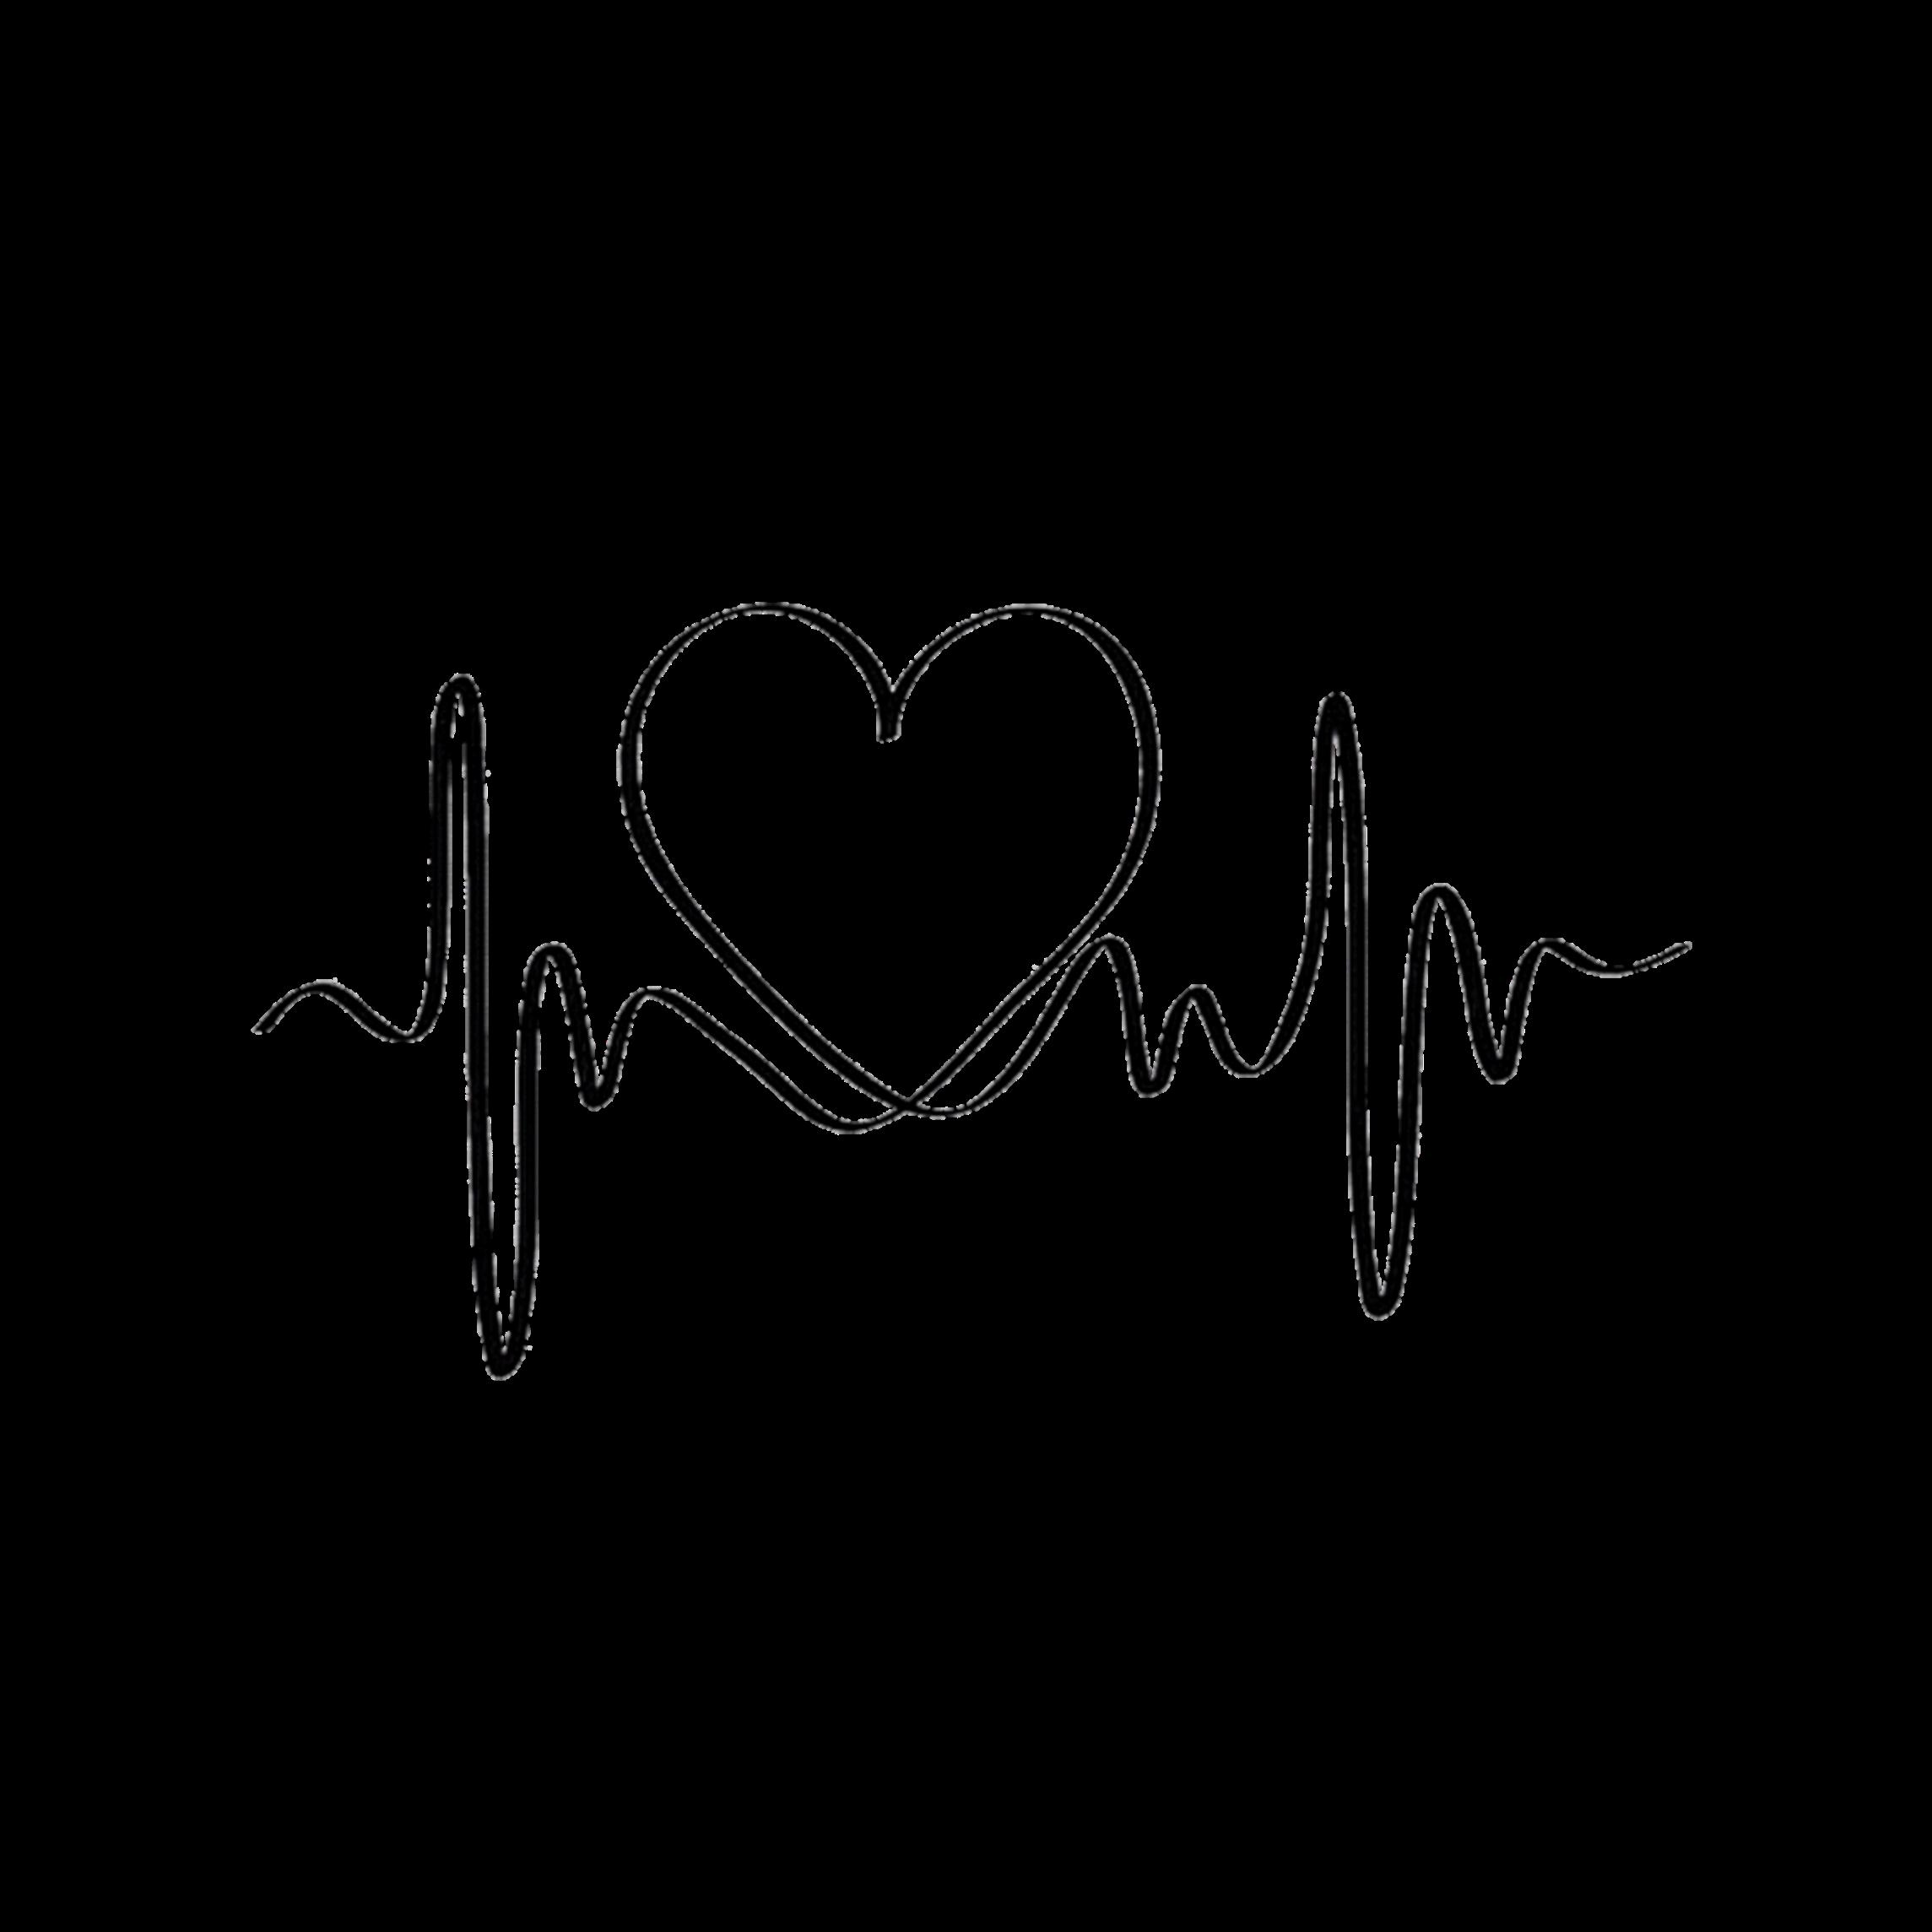 Картинка кардиограмма сердца черно-белая